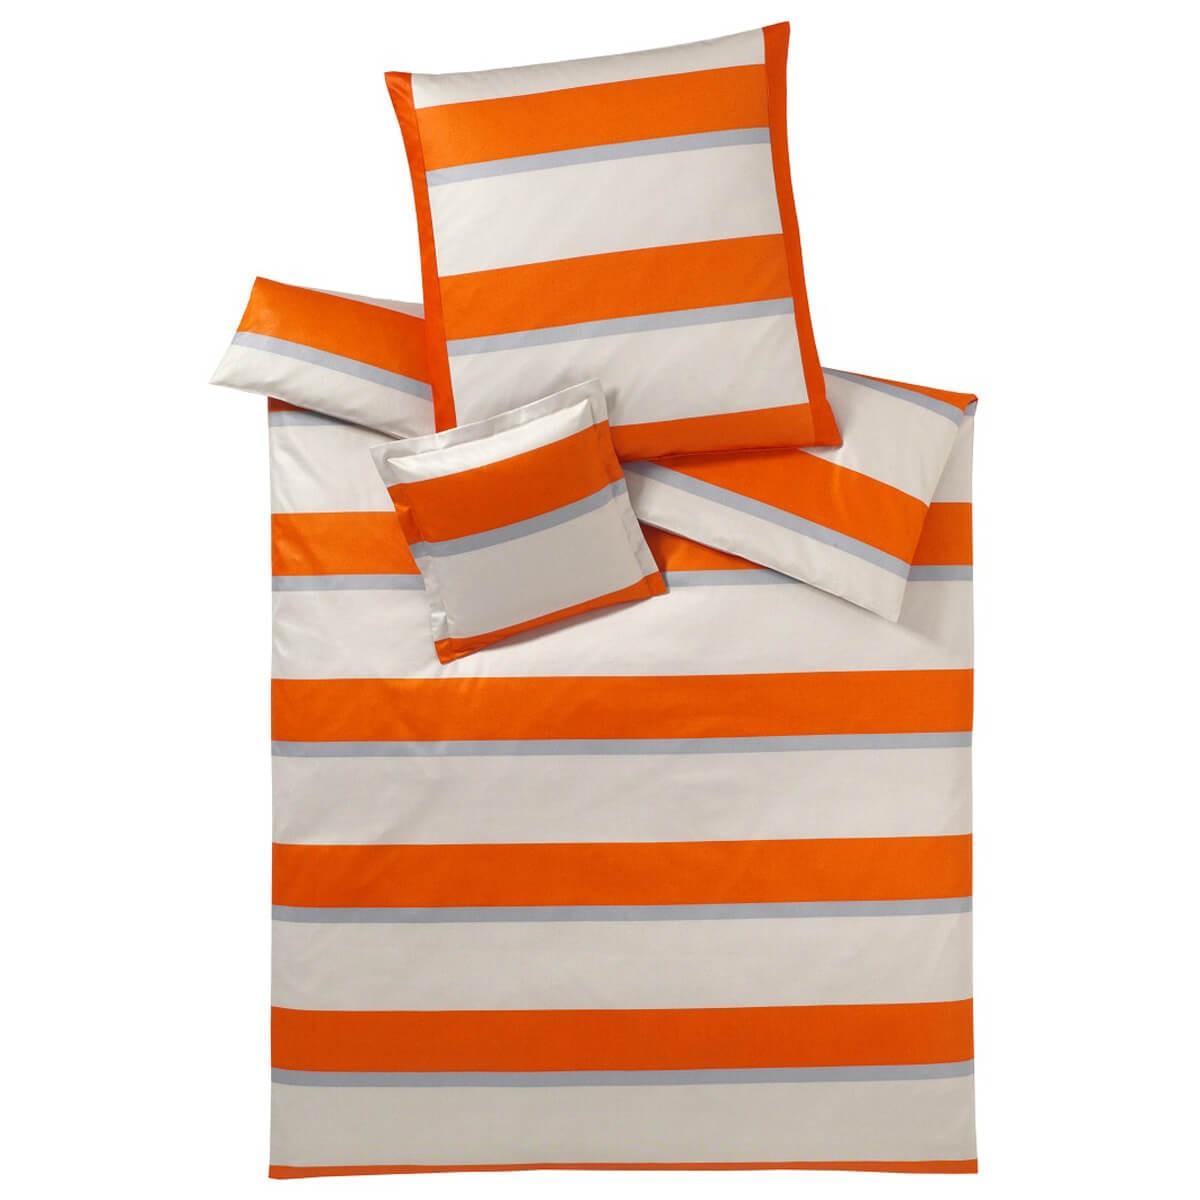 bettw sche elegante broadway 2122 orange. Black Bedroom Furniture Sets. Home Design Ideas